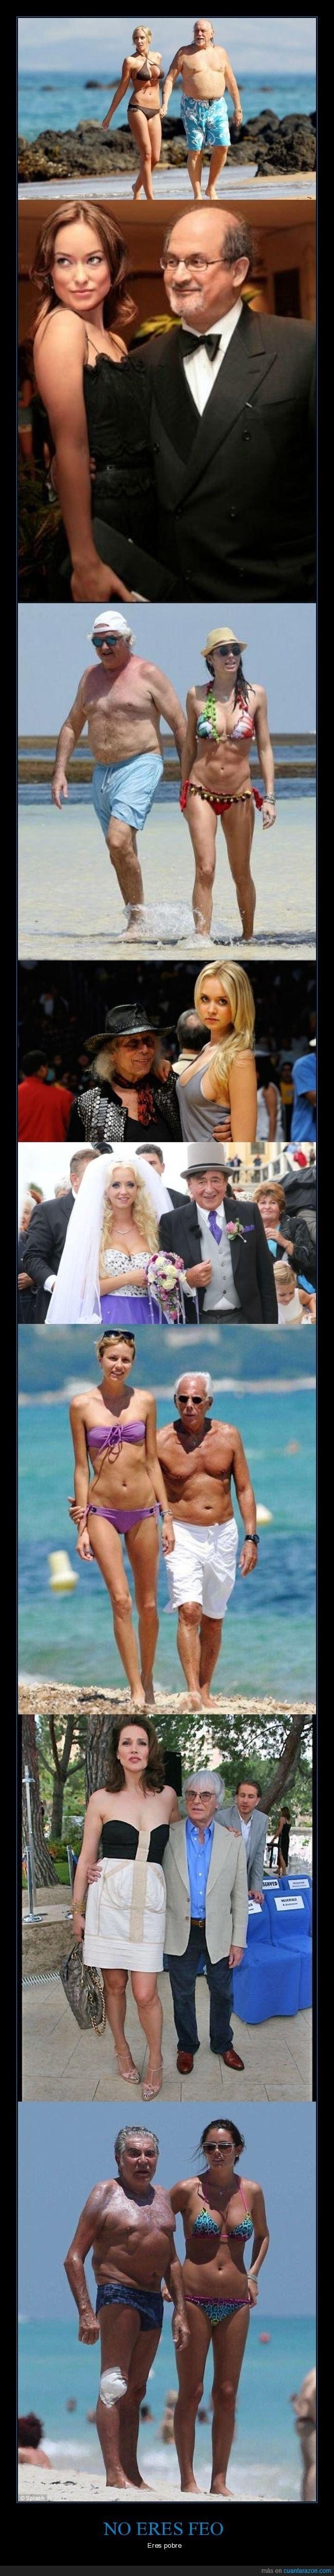 chicas,parejas,ricos,viejos